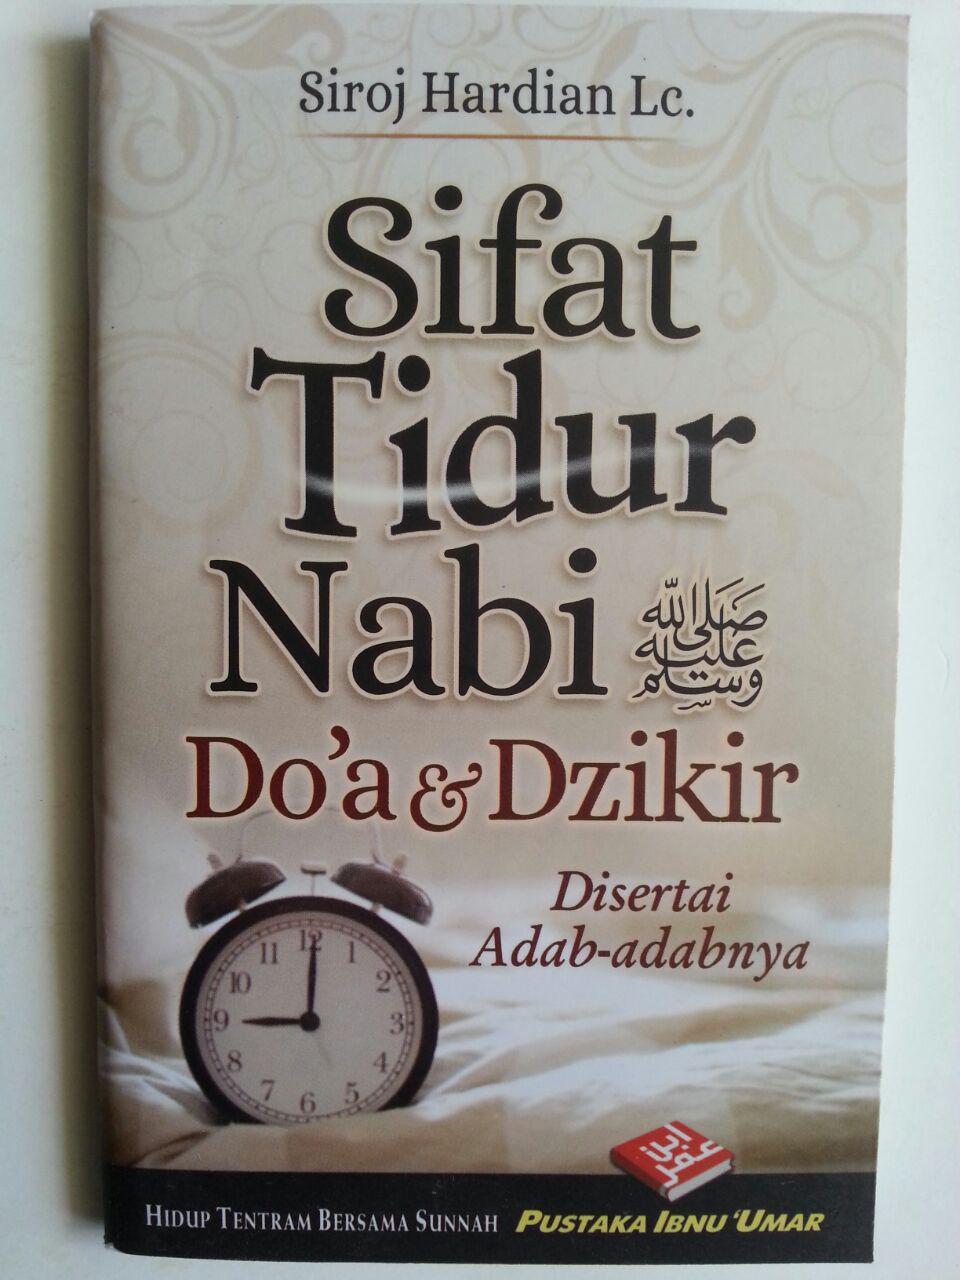 Buku Saku Sifat Tidur Nabi Doa Dan Dzikir Disertai Adabnya cover 2